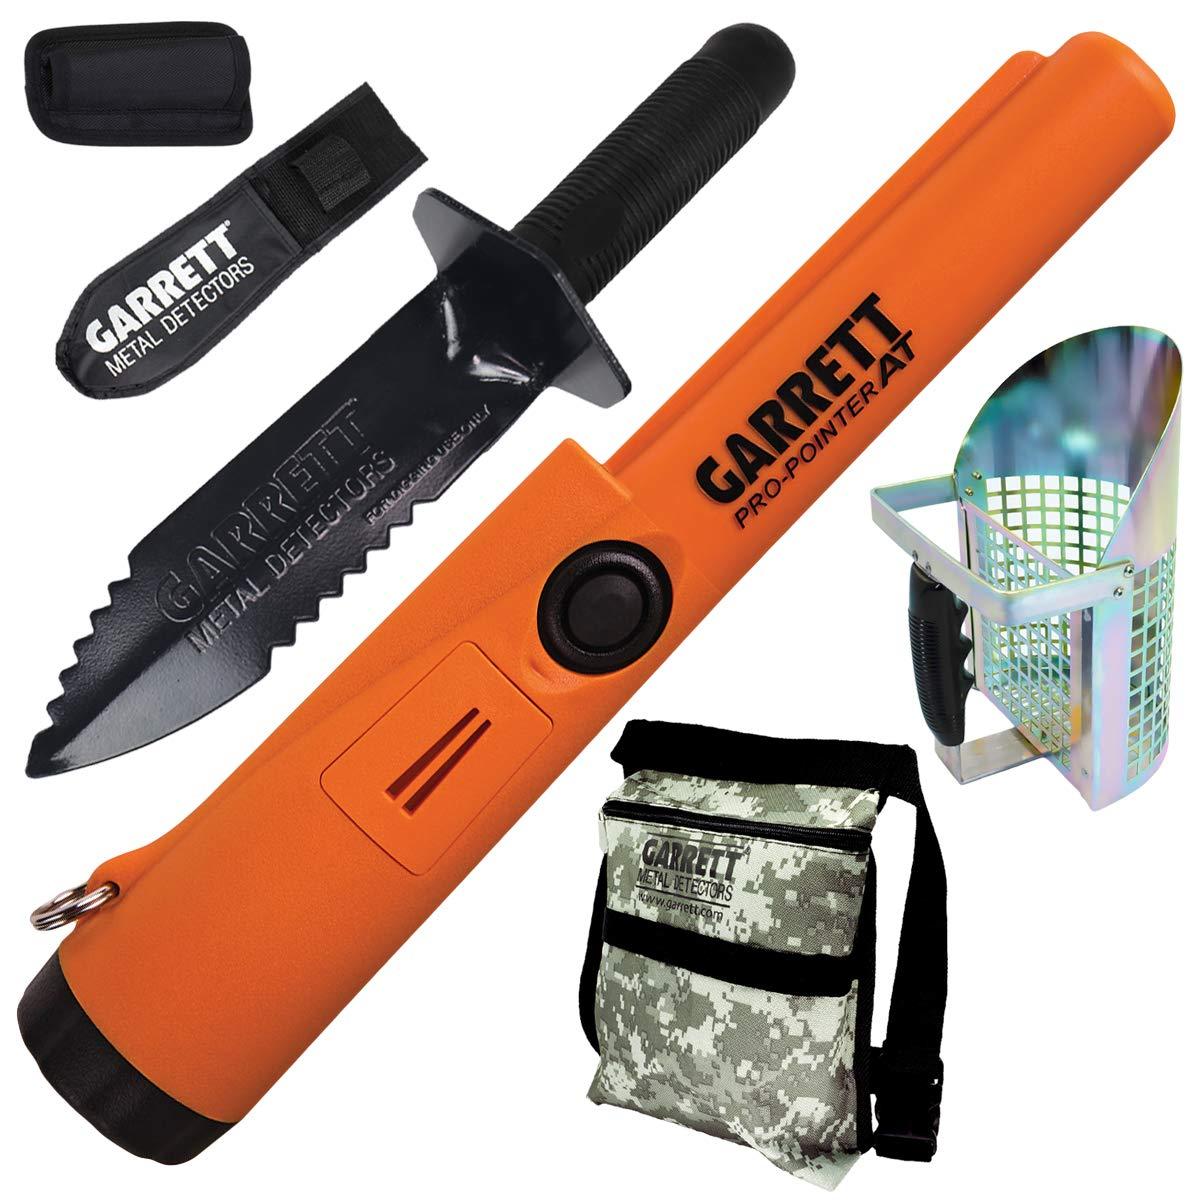 Amazon.com : Garrett Propointer AT + Garrett Edge Digger + Garrett Metal Scoop + Garrett Camo Diggers Pouch : Garden & Outdoor